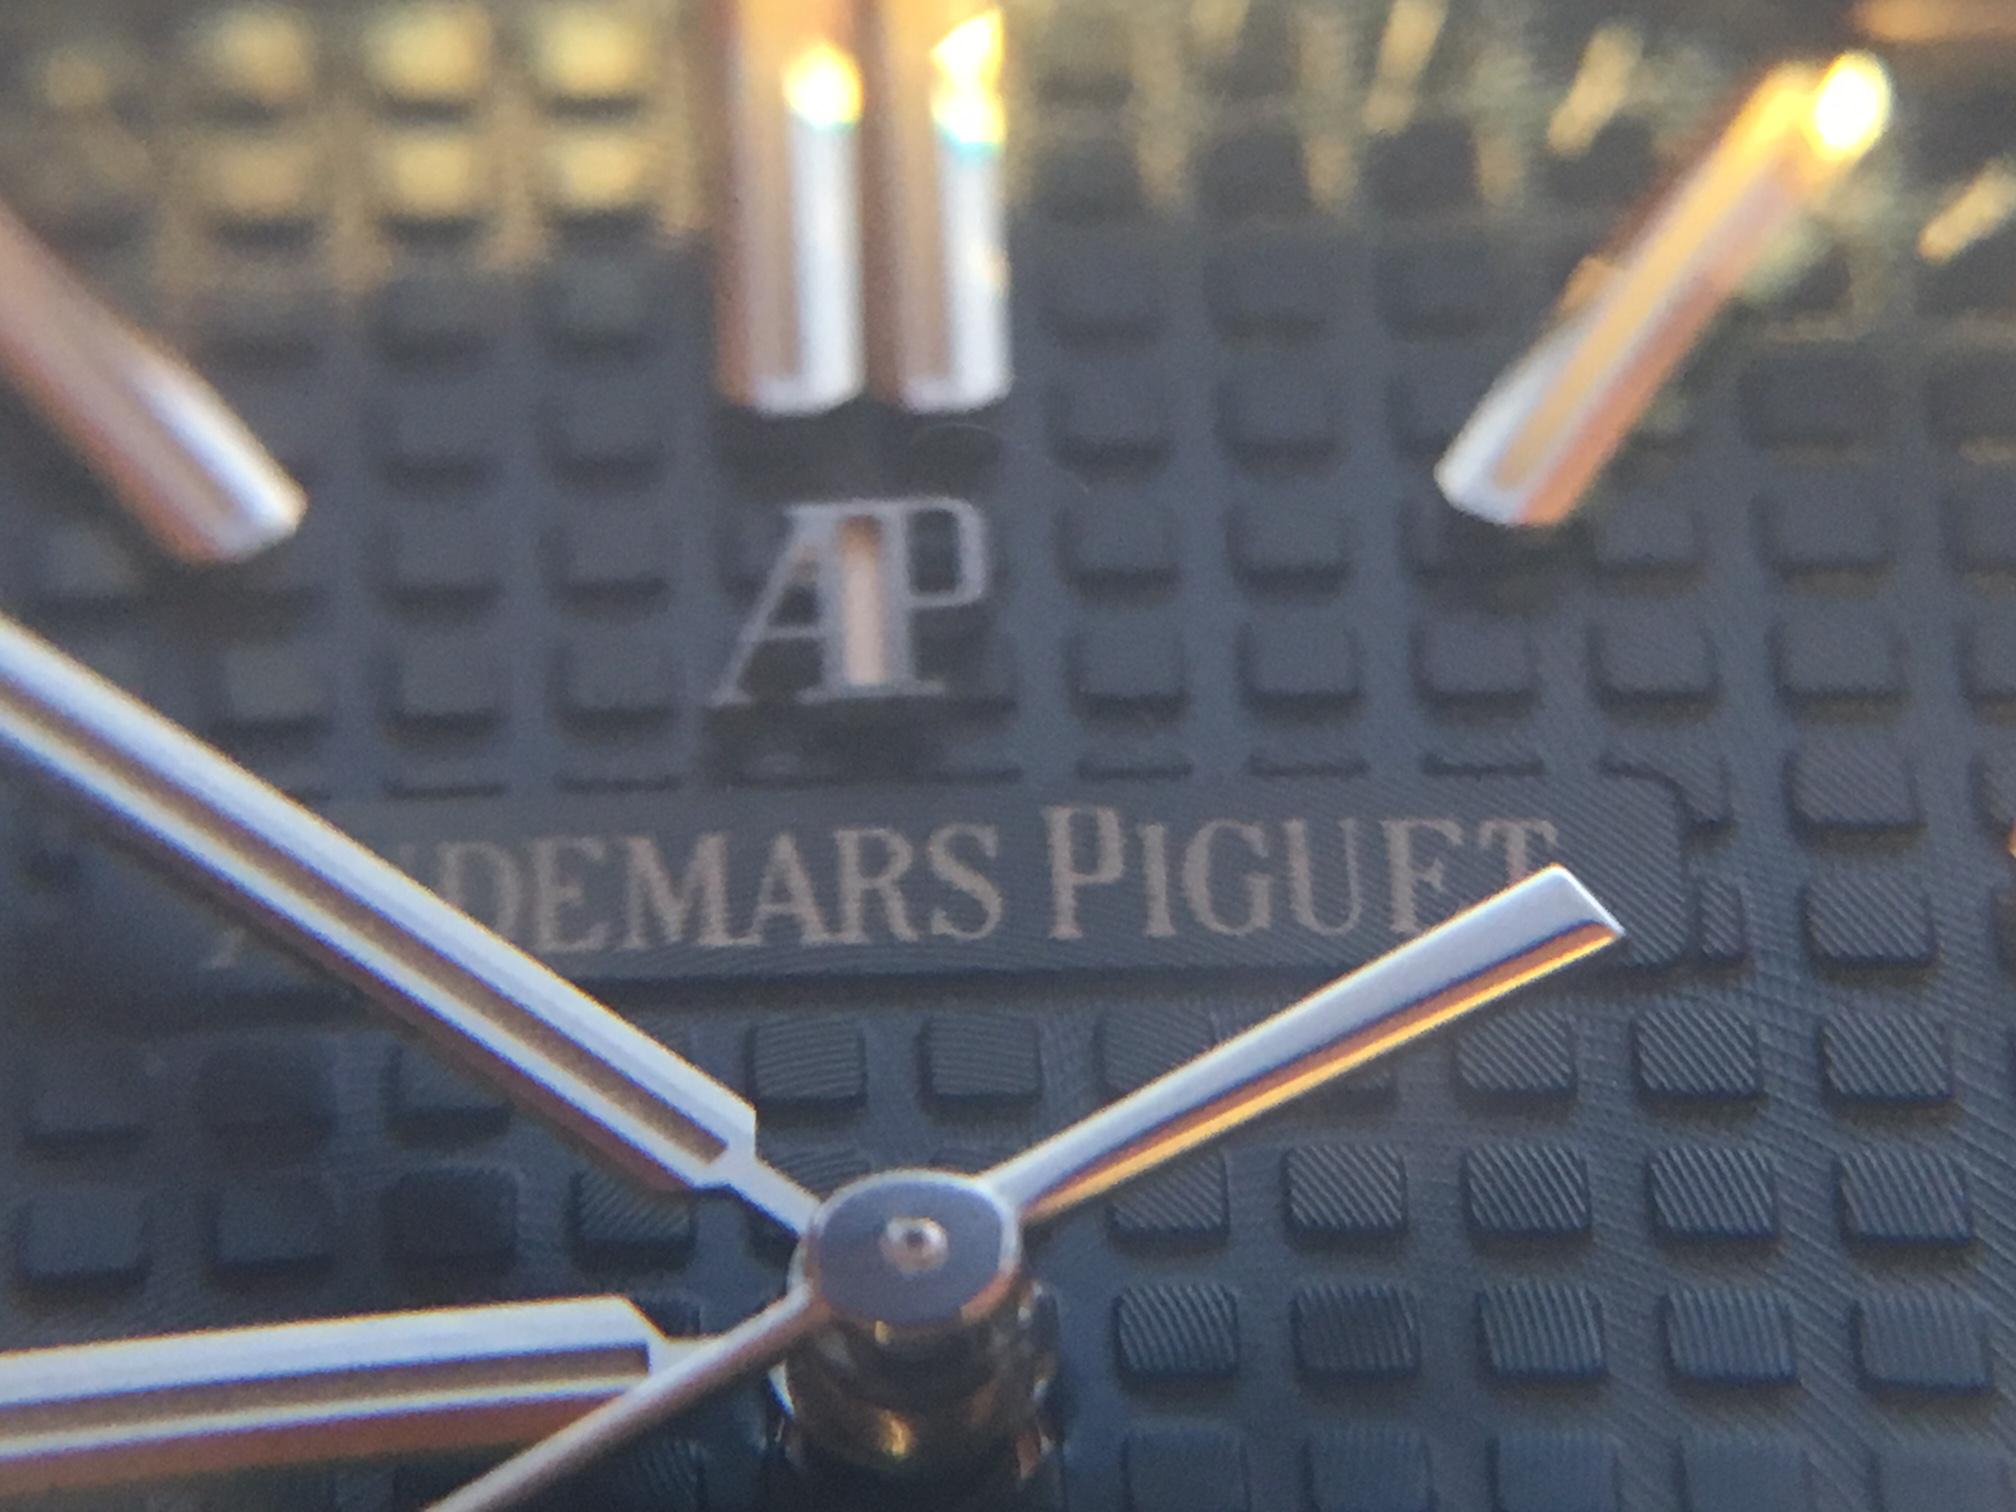 Audemars Piguet Royal Oak - Ρολόγια Replica